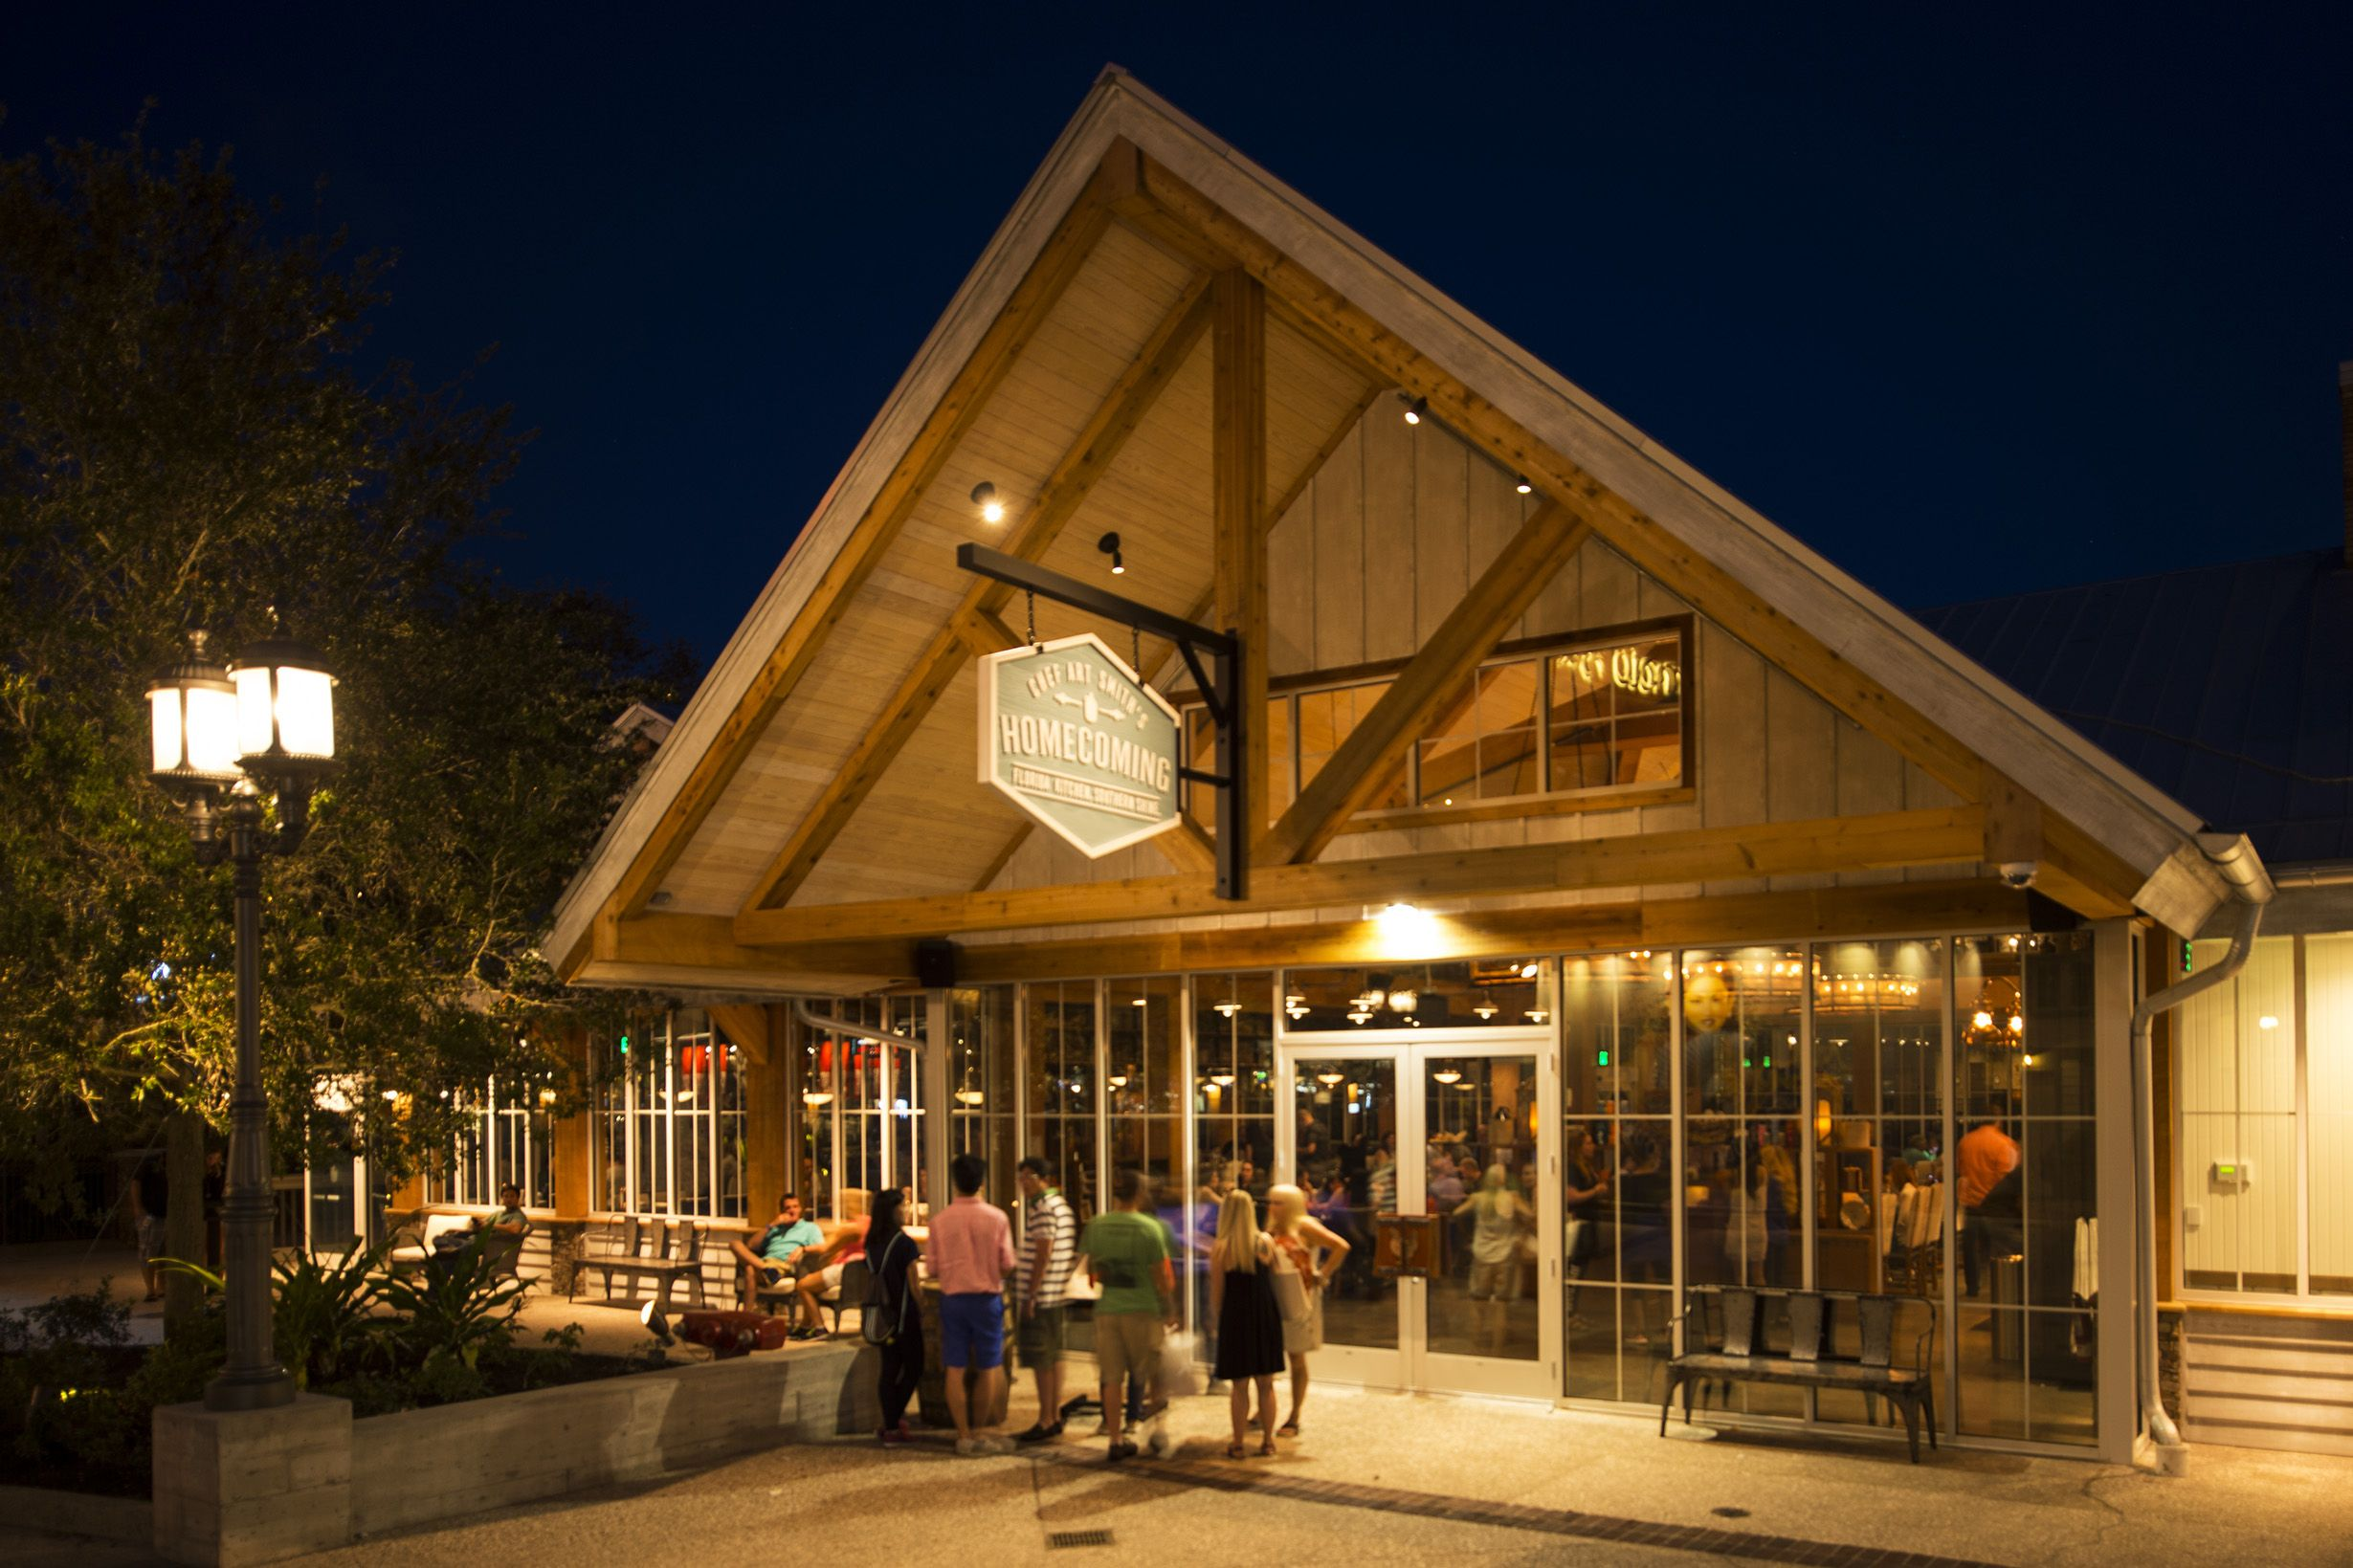 Art Smith's Homecoming Kitchen and Shine Bar Disney Springs Orlando